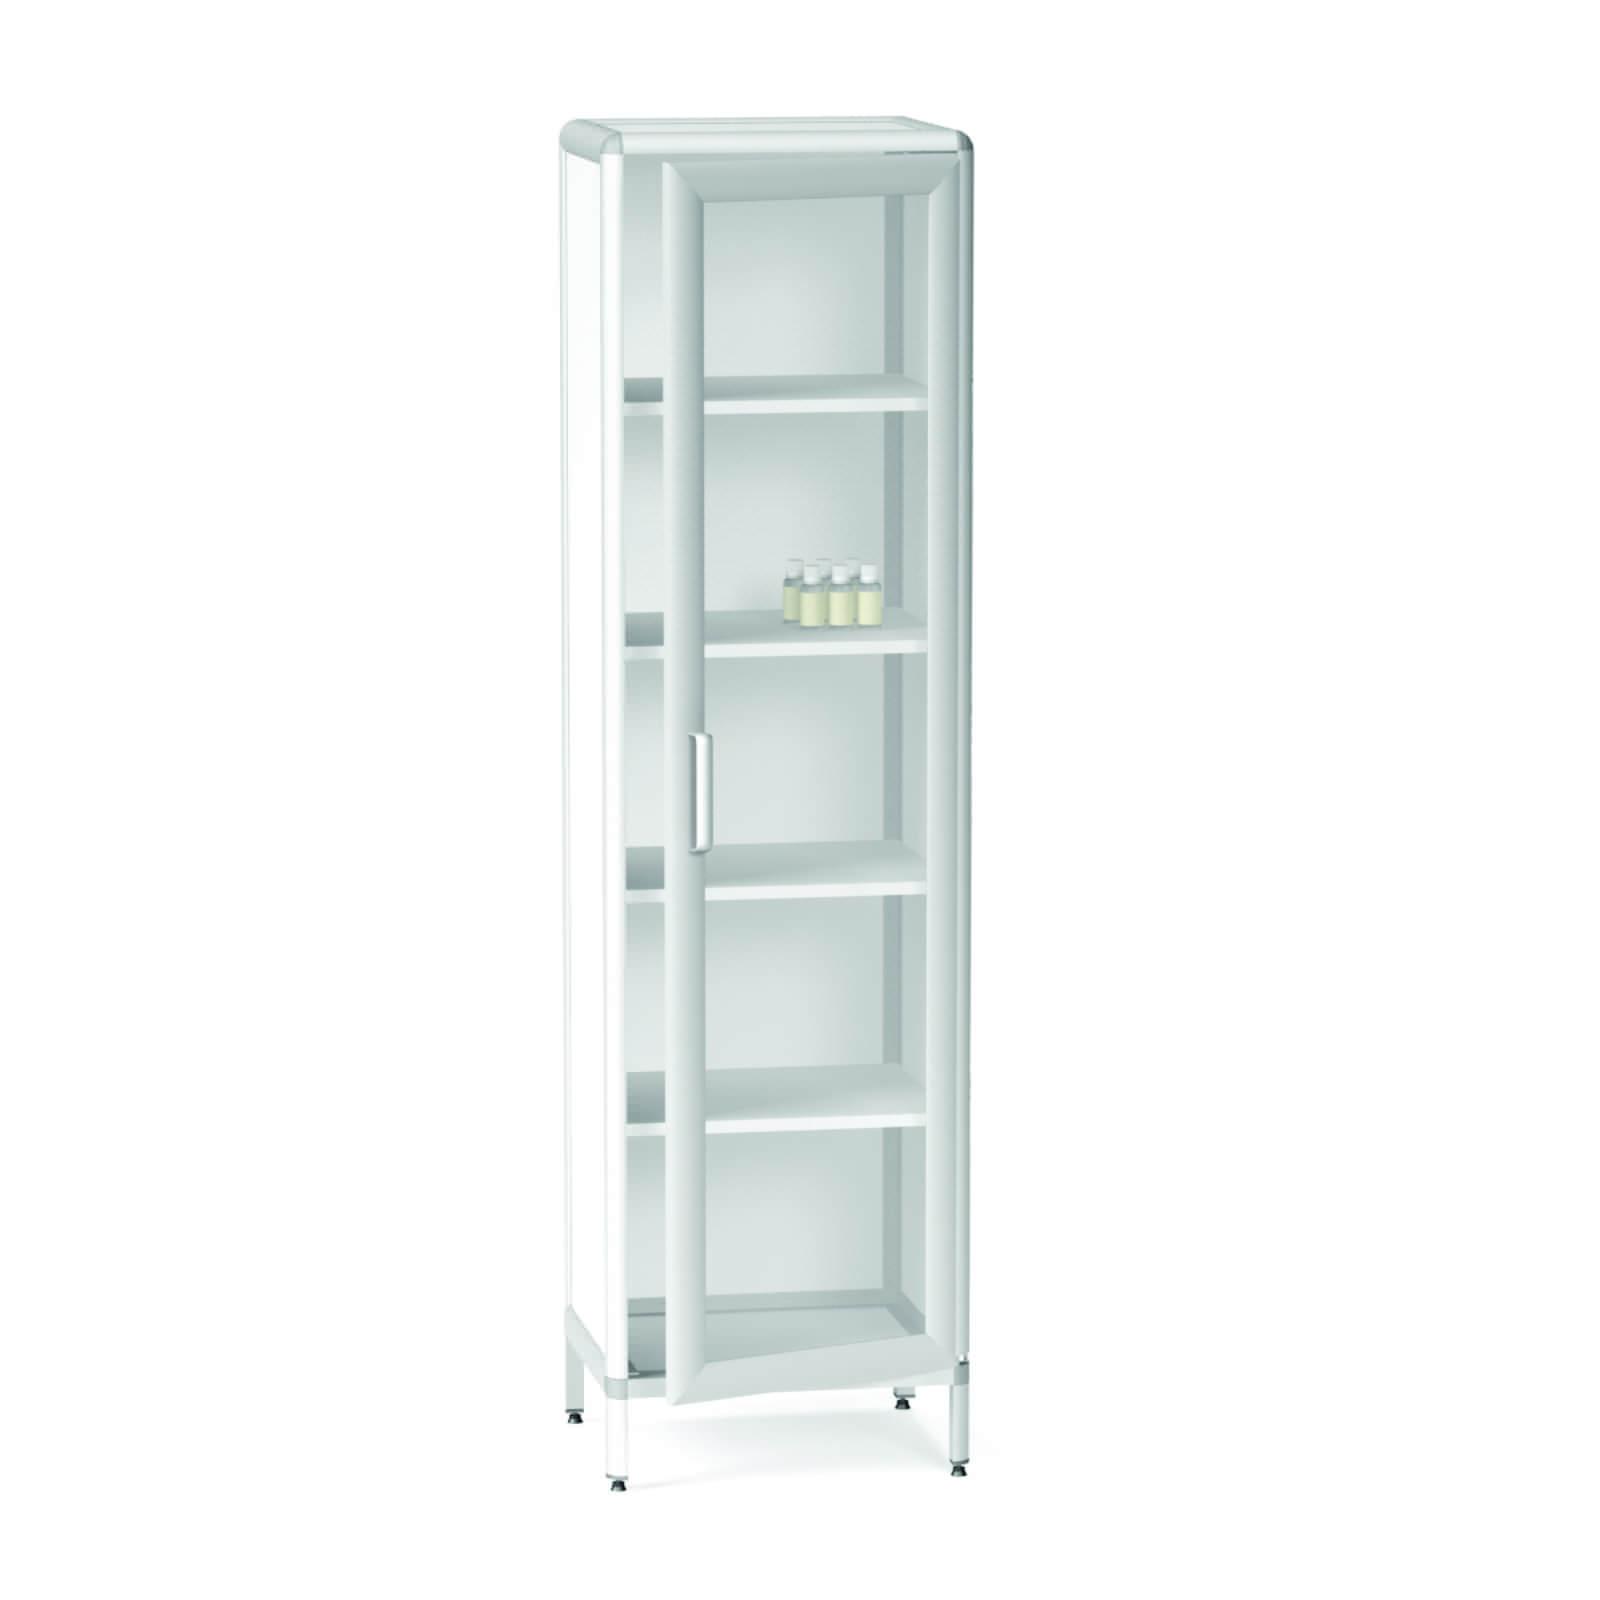 Медицинский шкаф ДМ-1-001-01